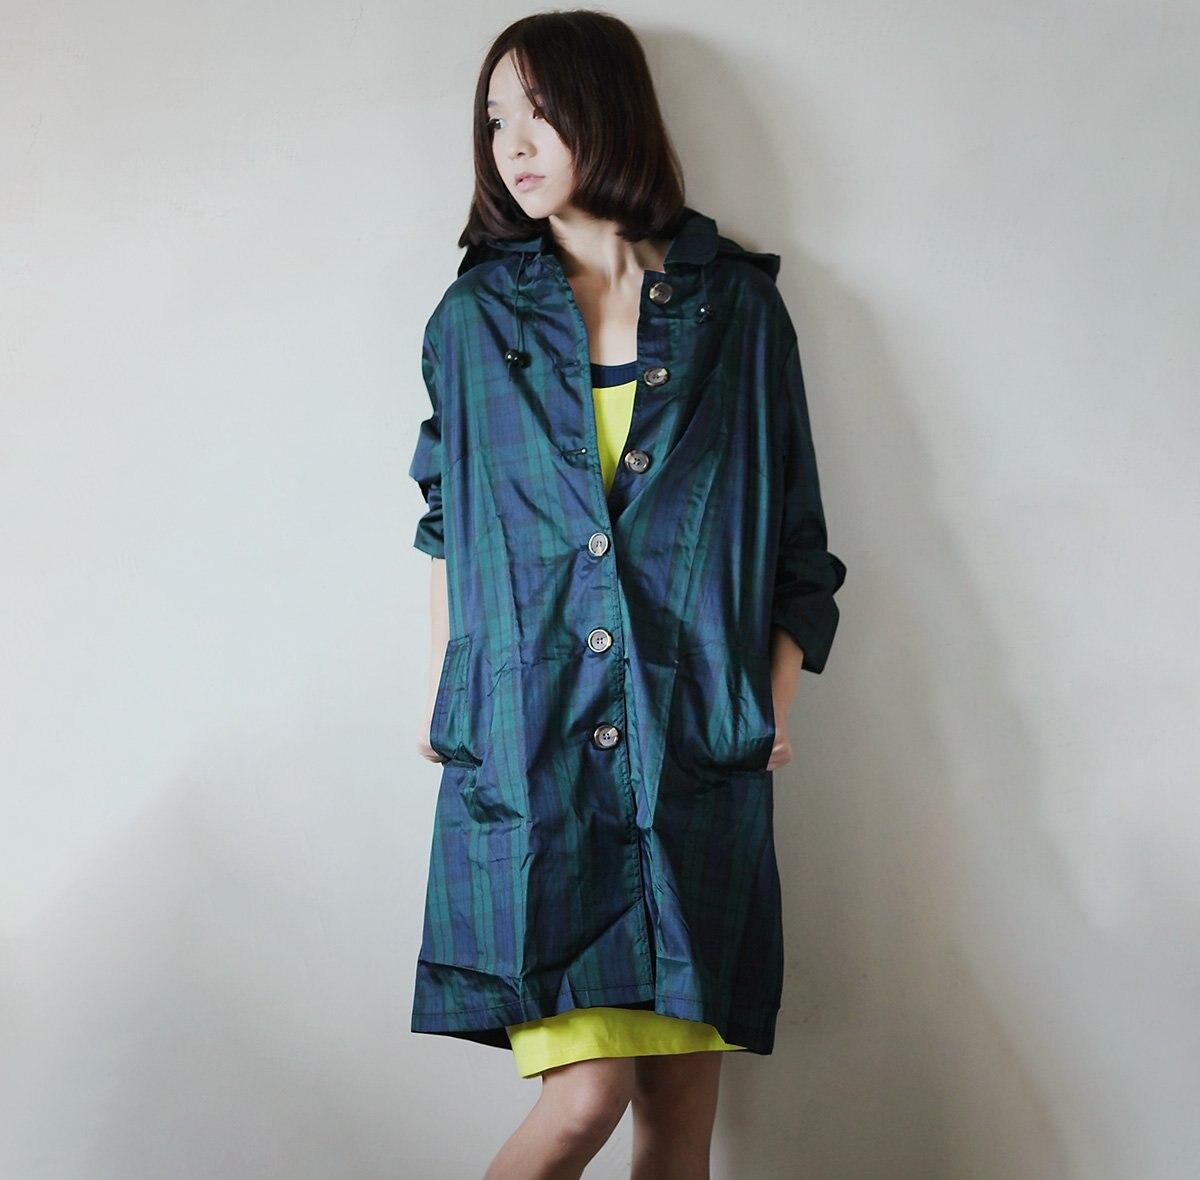 Rain Proof Trench Coat Fashion Women S Coat 2017